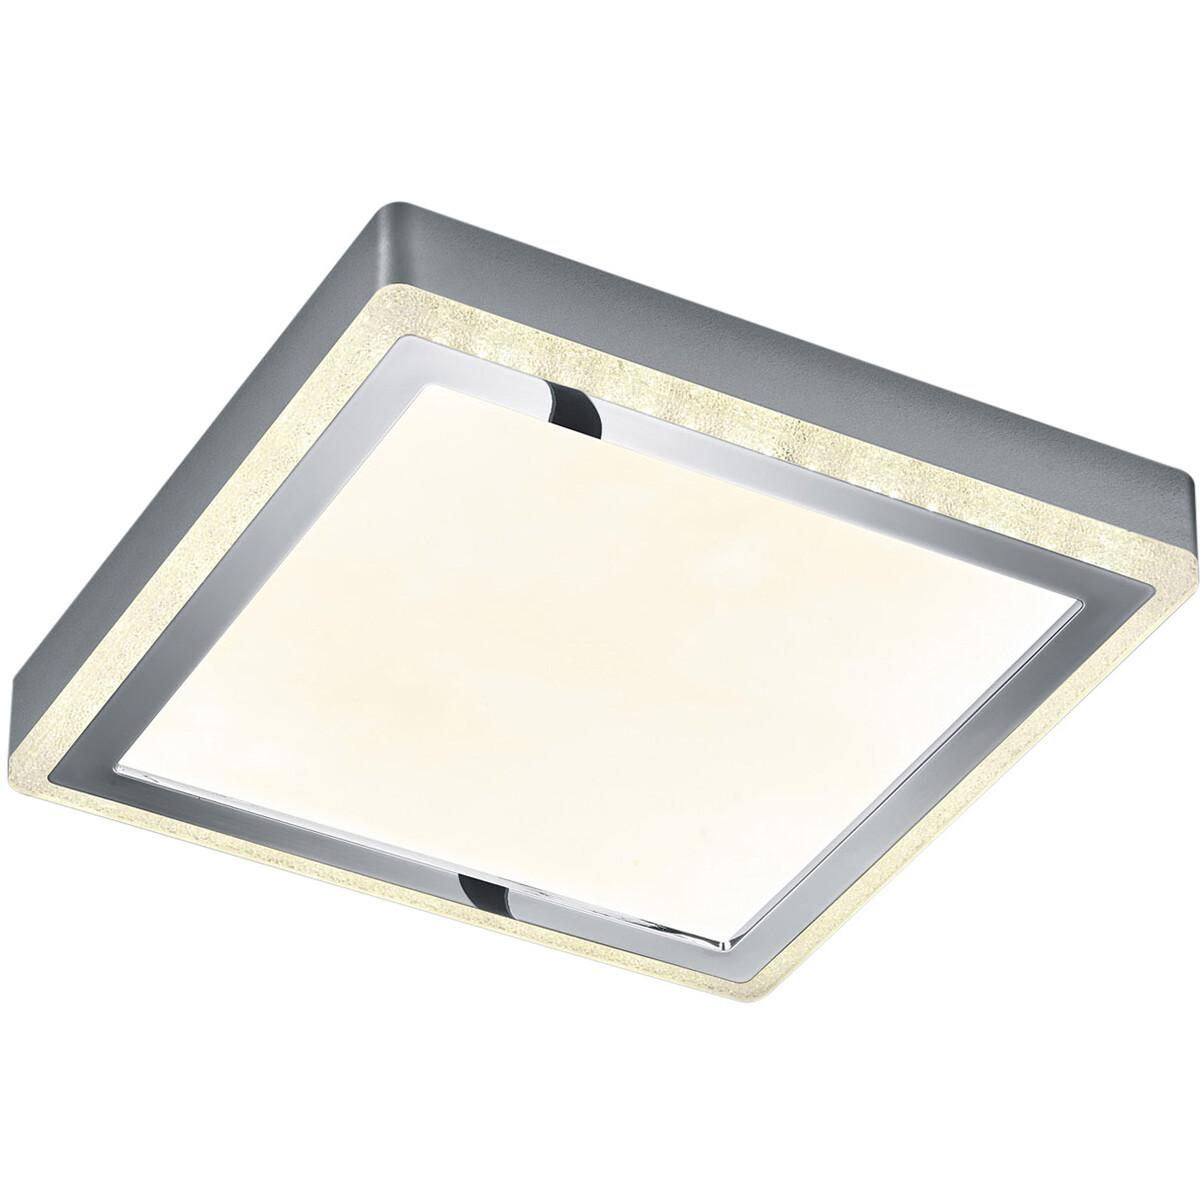 LED Plafondlamp - Plafondverlichting - Trion Slodan - 12W - Aanpasbare Kleur - Vierkant - Mat Wit -